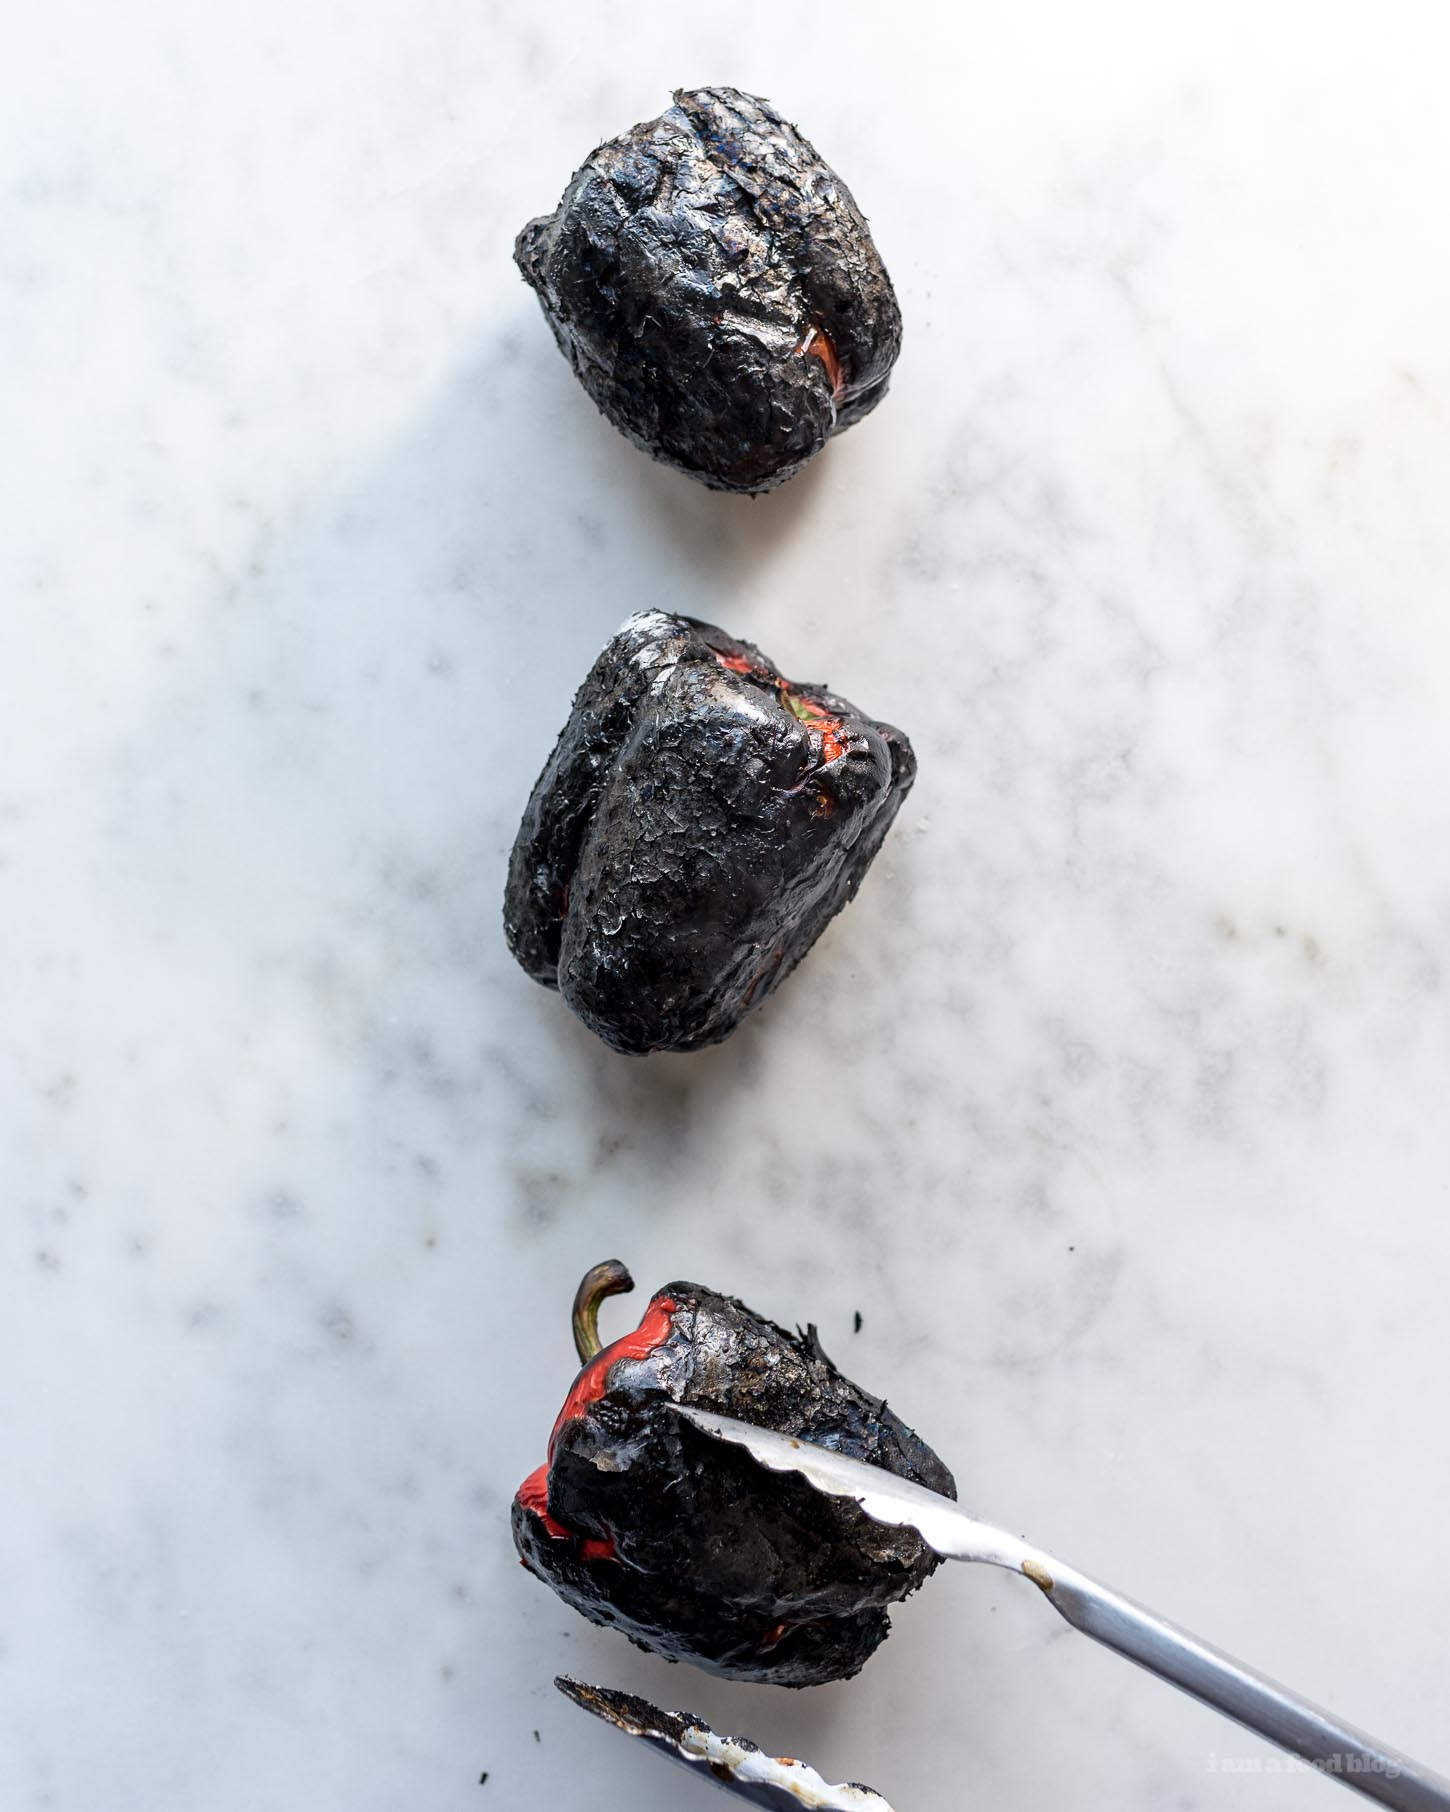 Ottolenghi's Muhammara/Roasted Red Pepper Dip Recipe - www.iamafoodblog.com